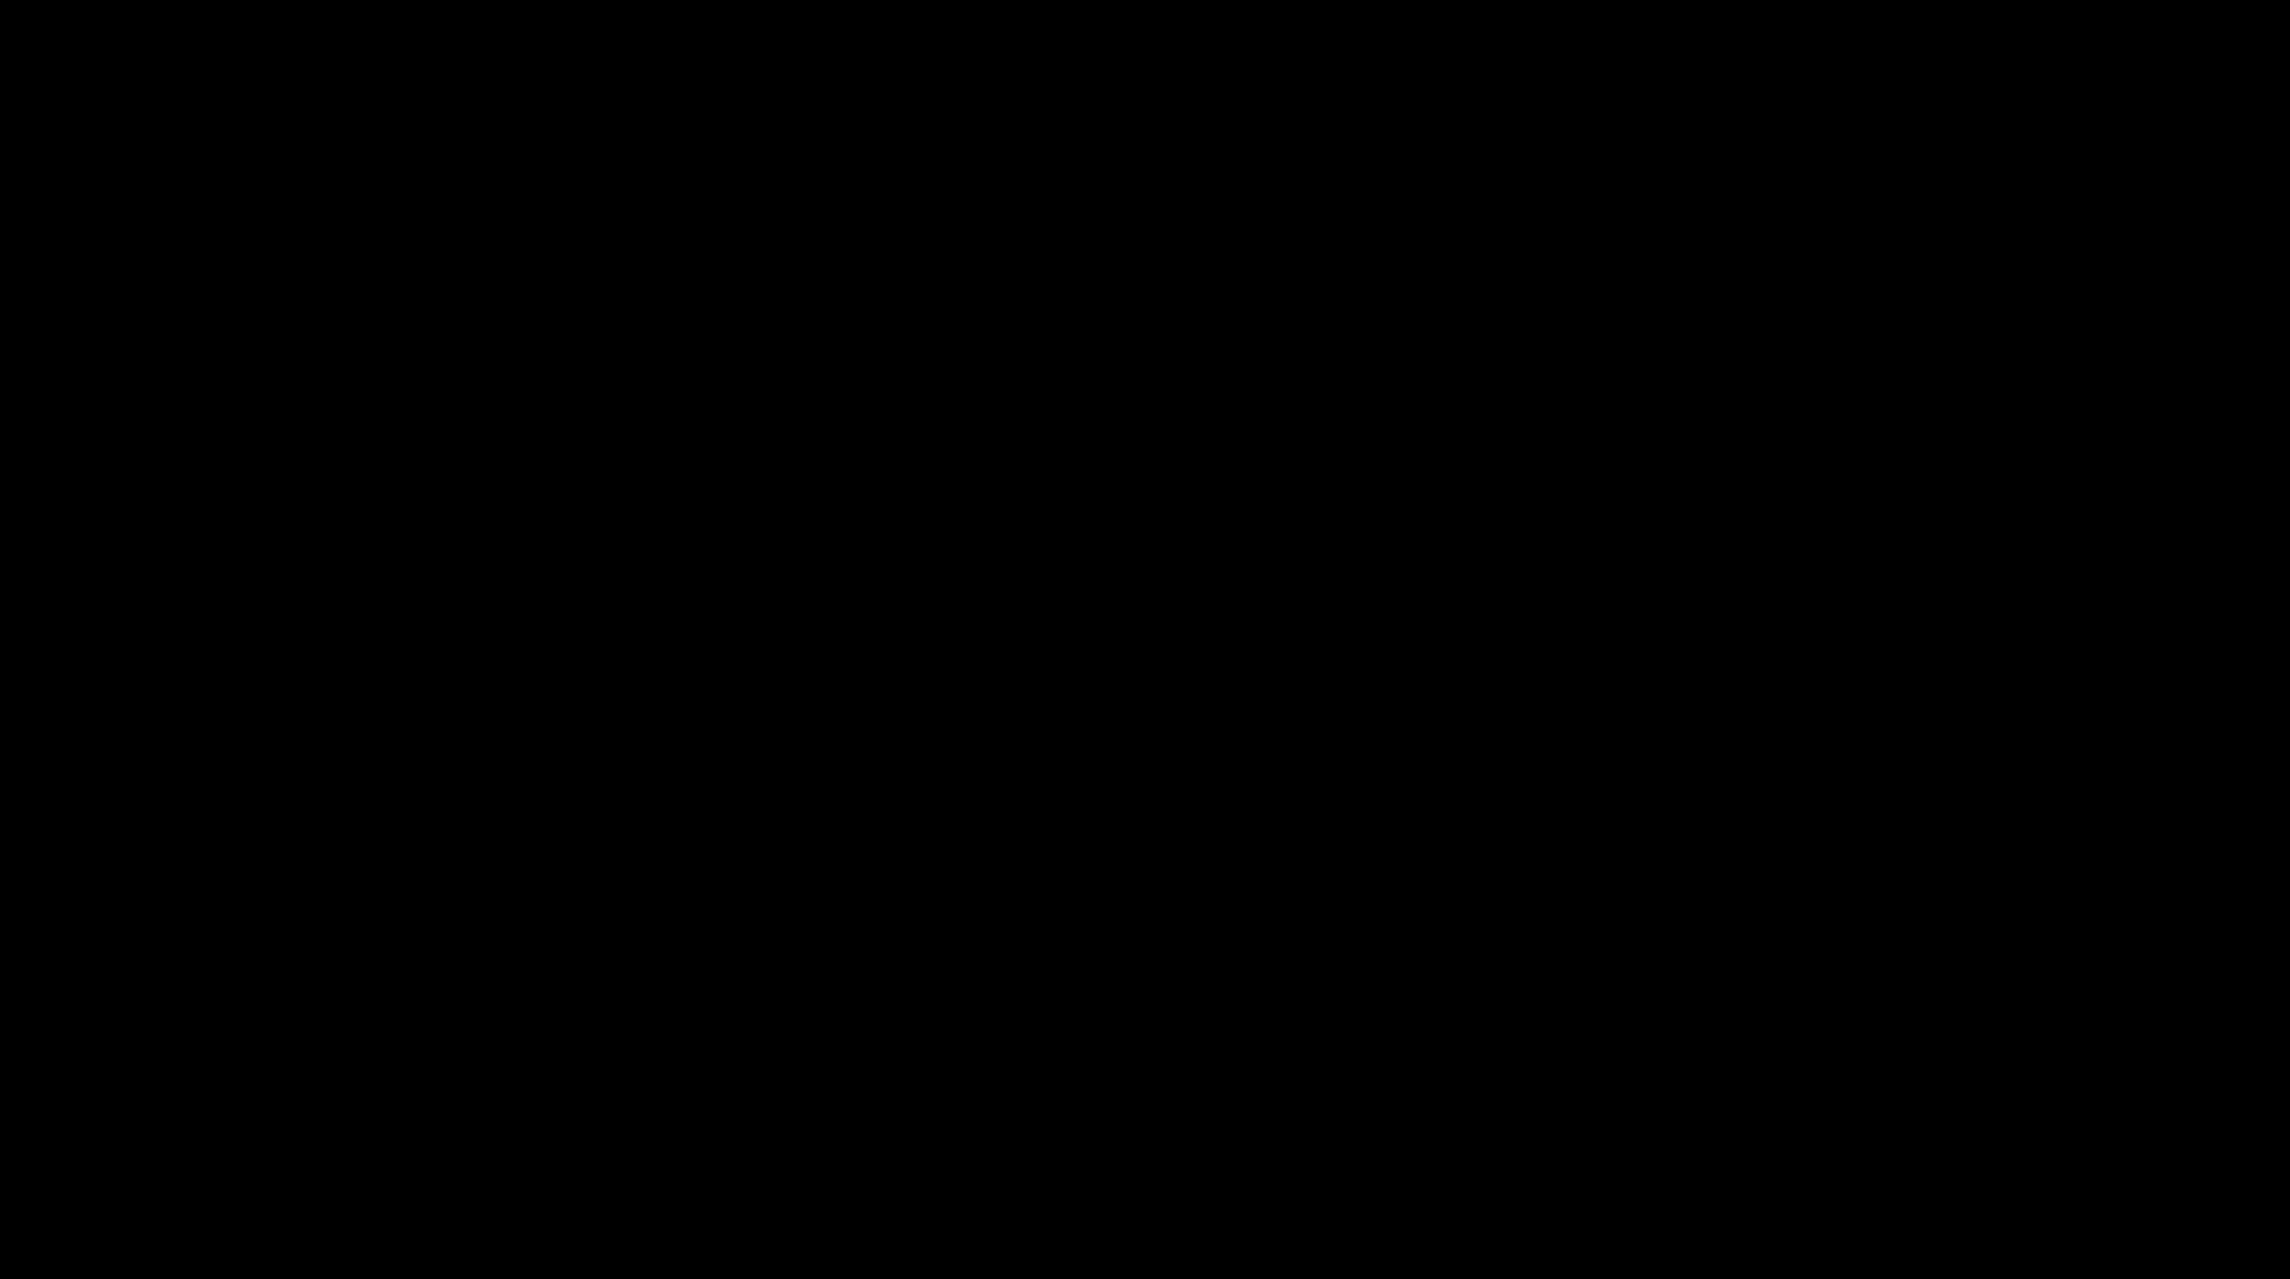 Narradívák logó